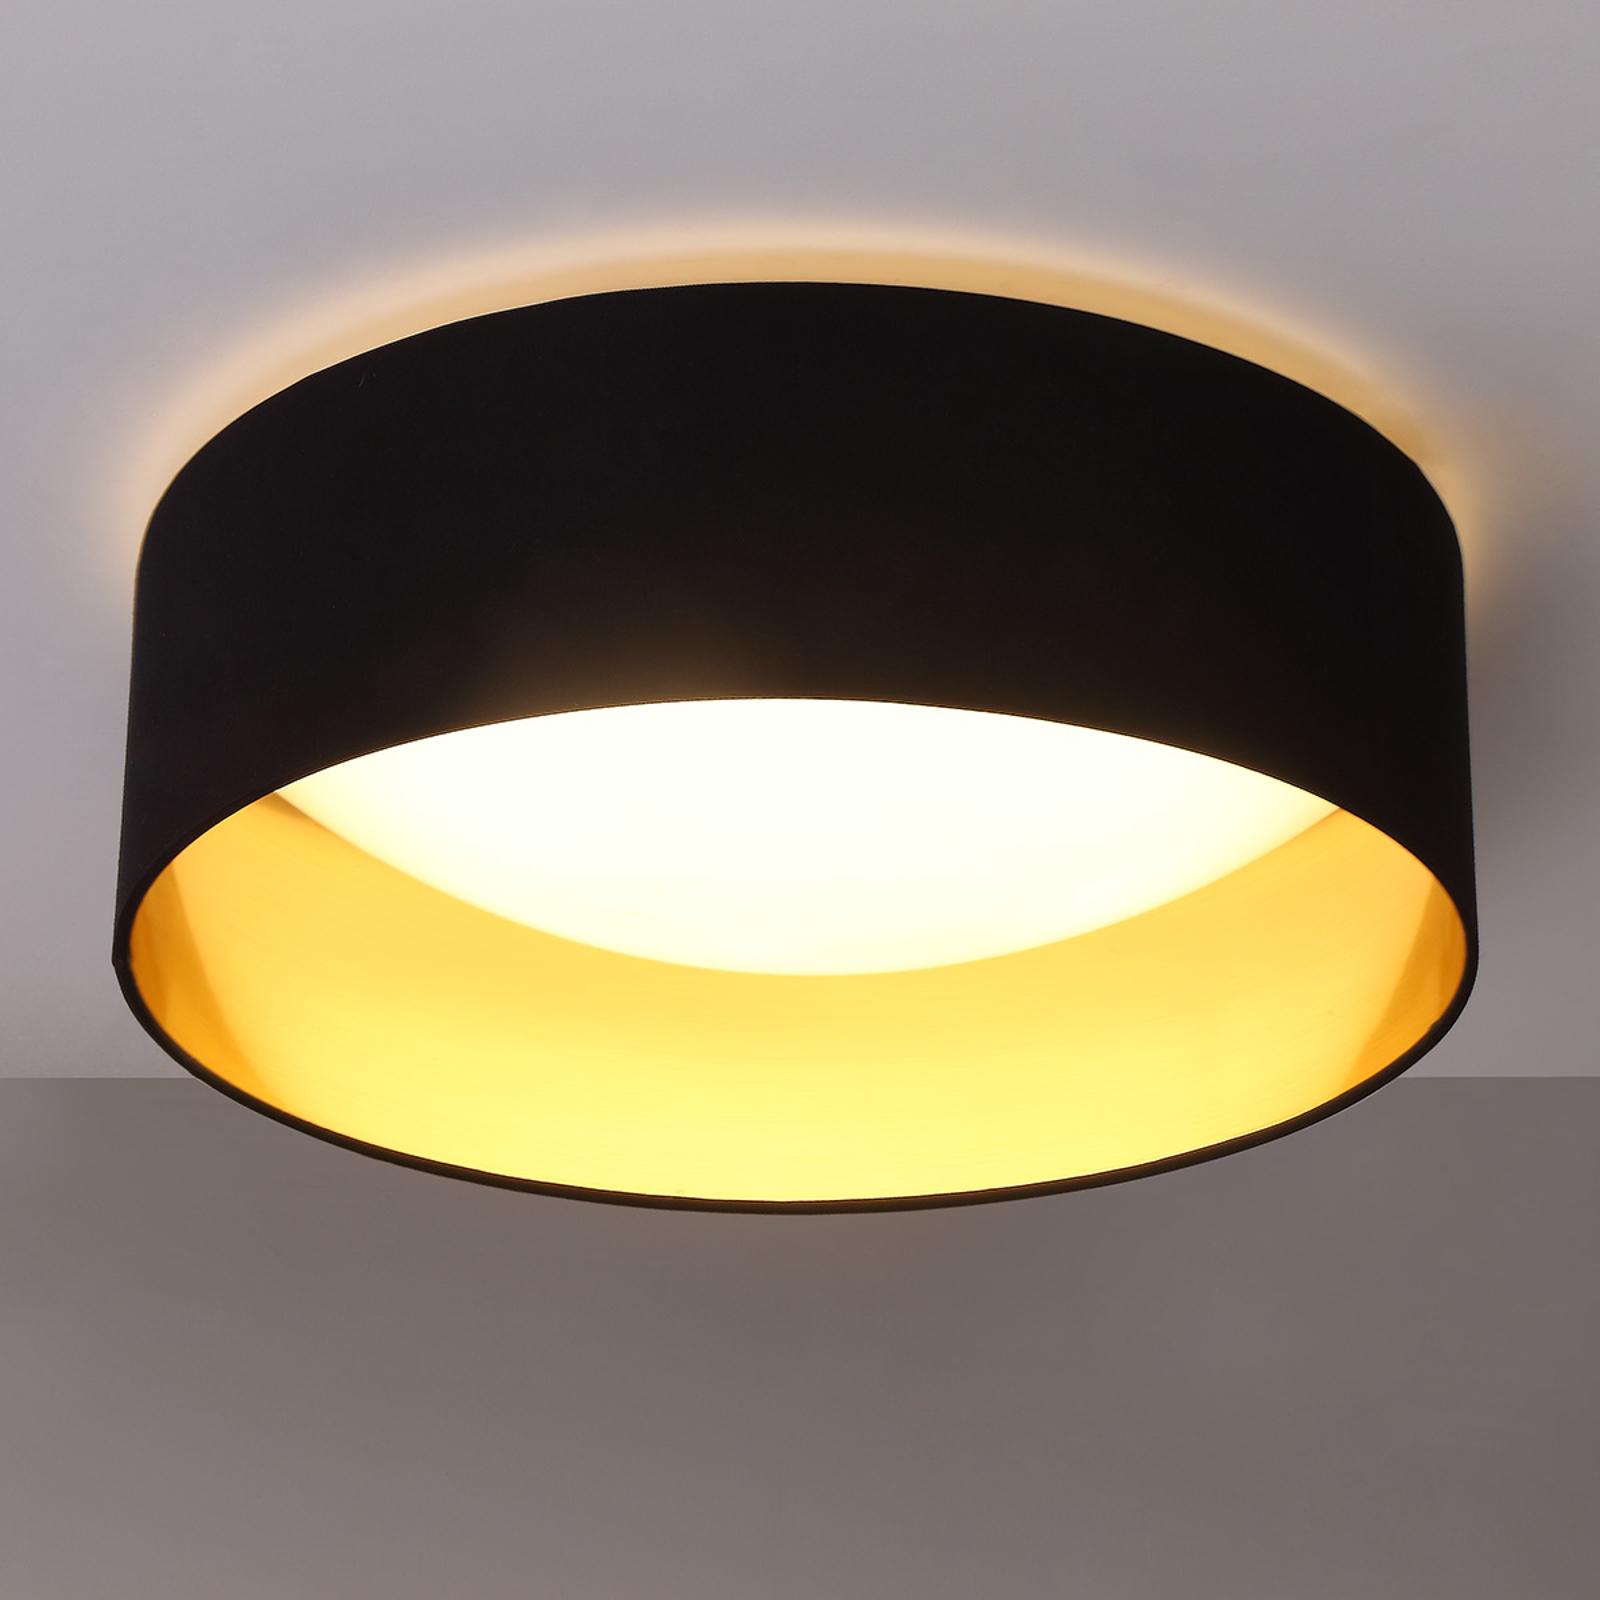 Materiałowa lampa sufitowa COLEEN, czarna